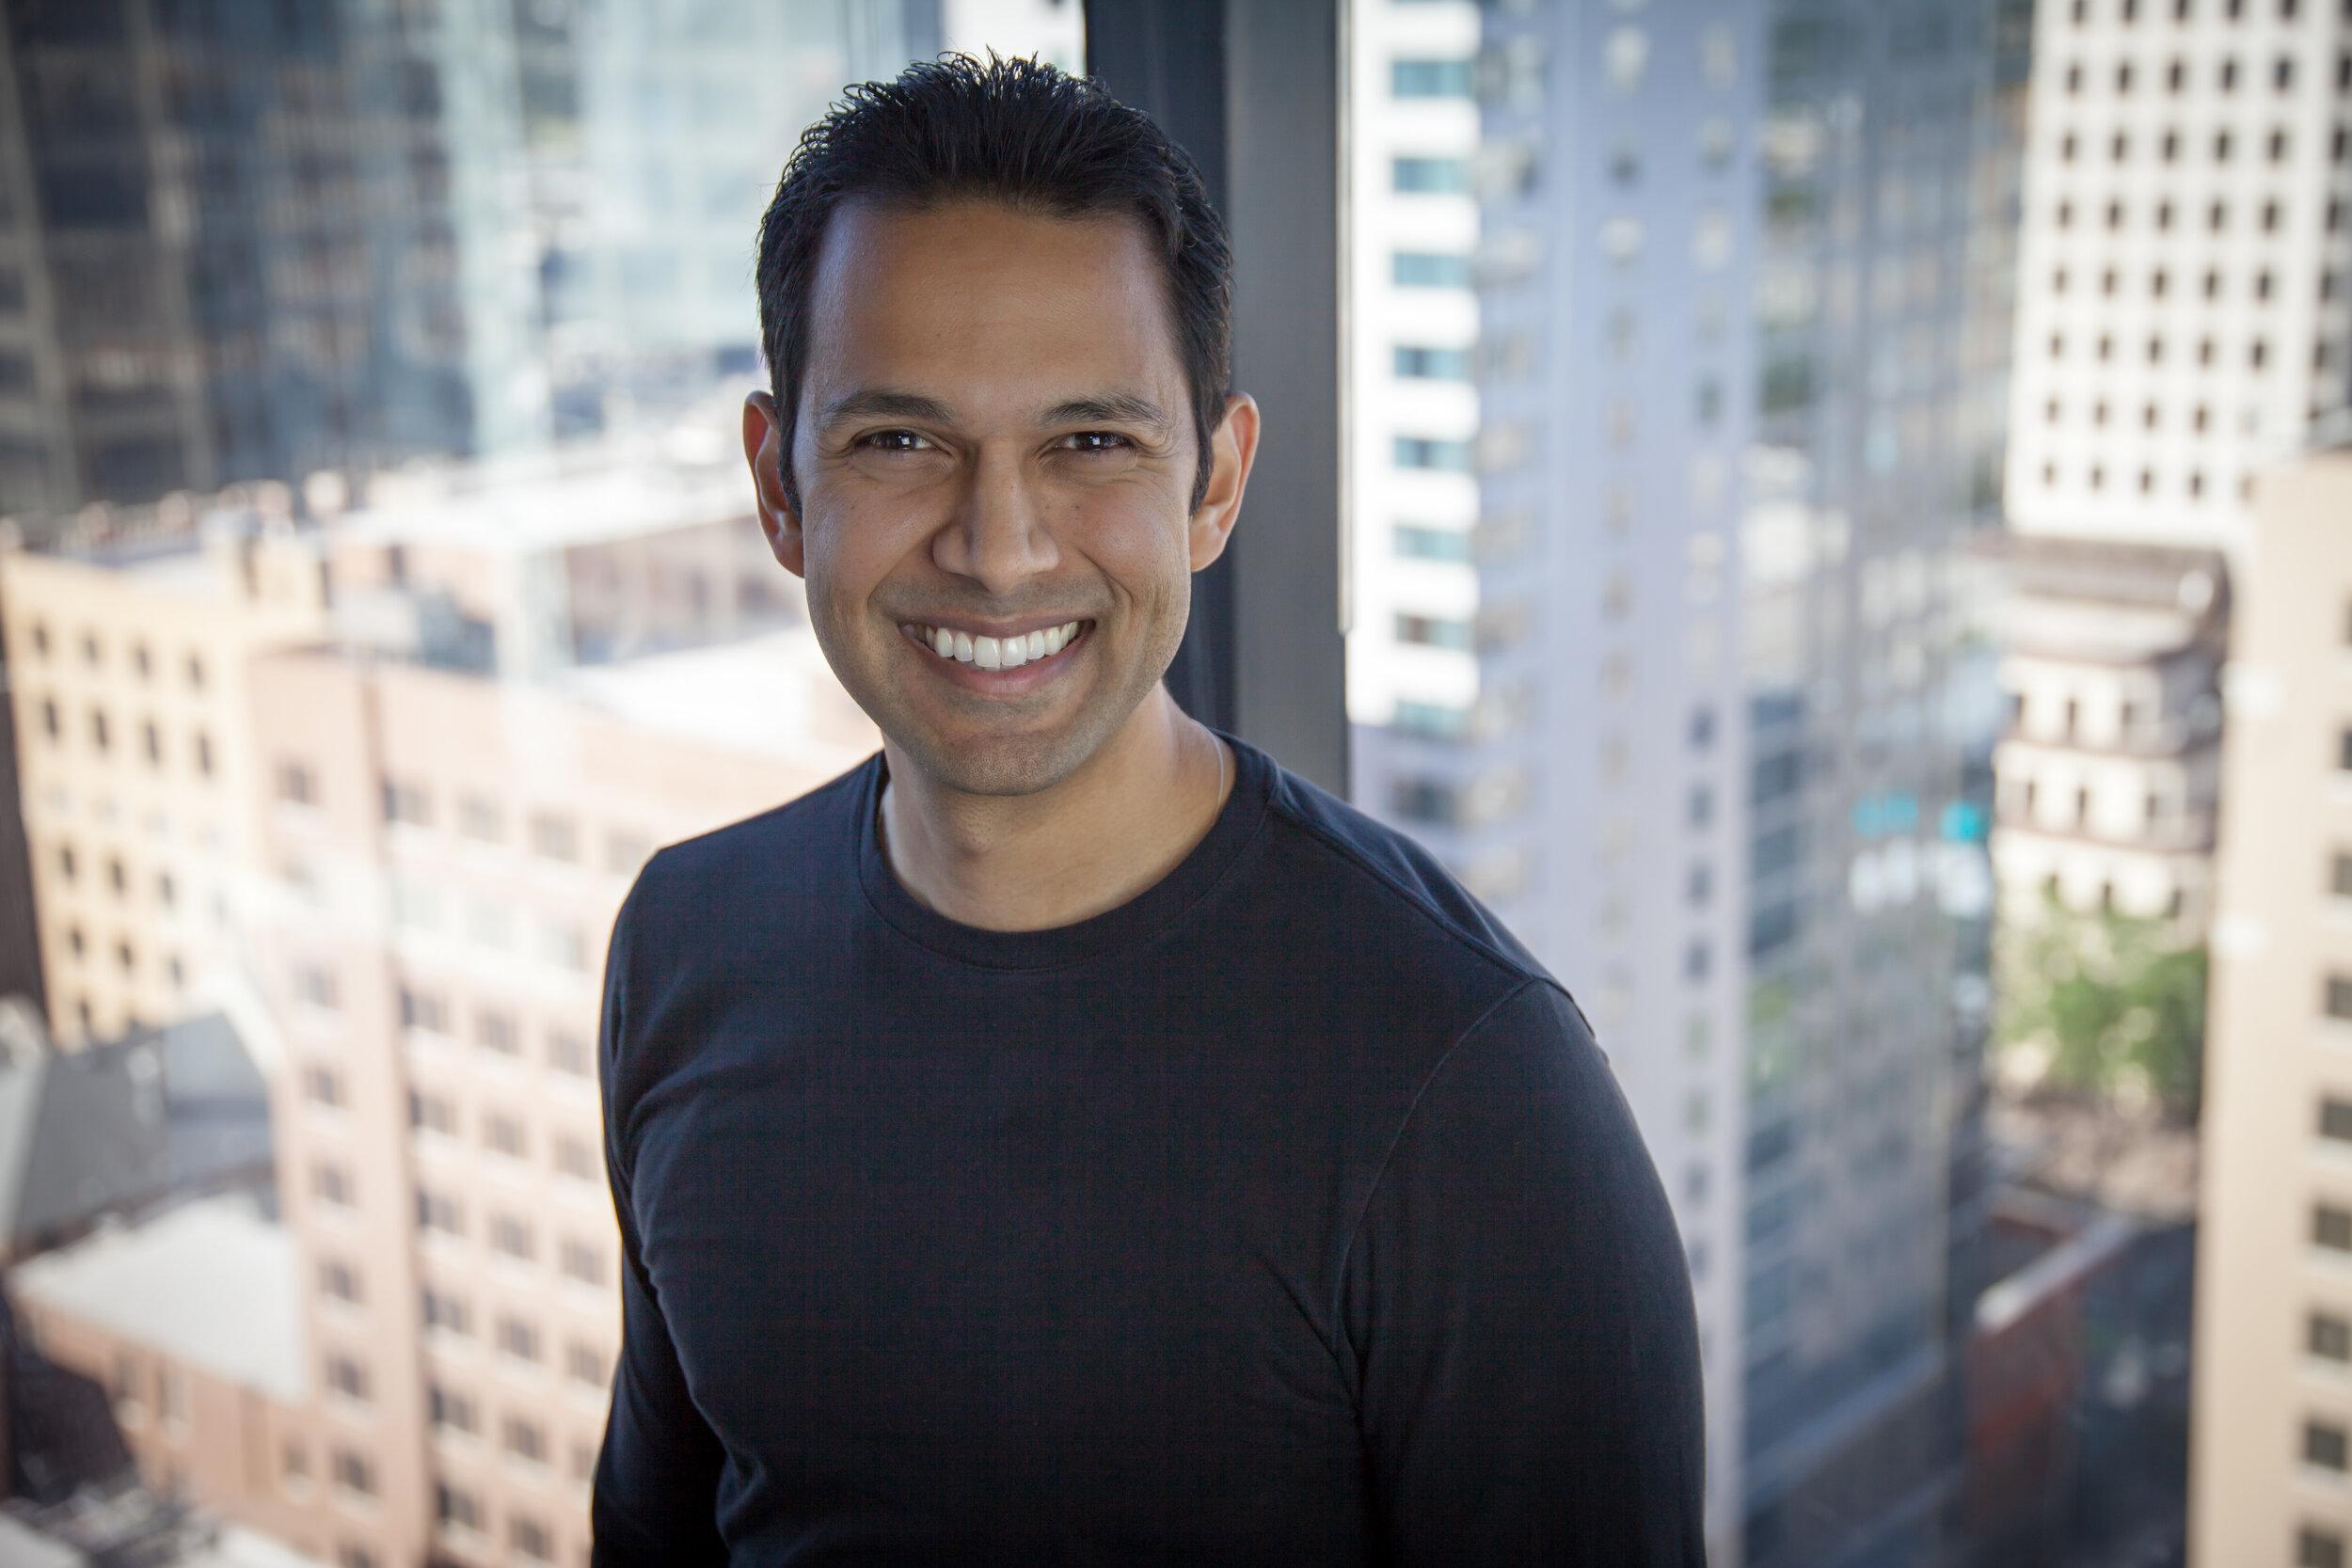 Yogi Patel - iuzeit - Centralized Product Data for Online Shoppers